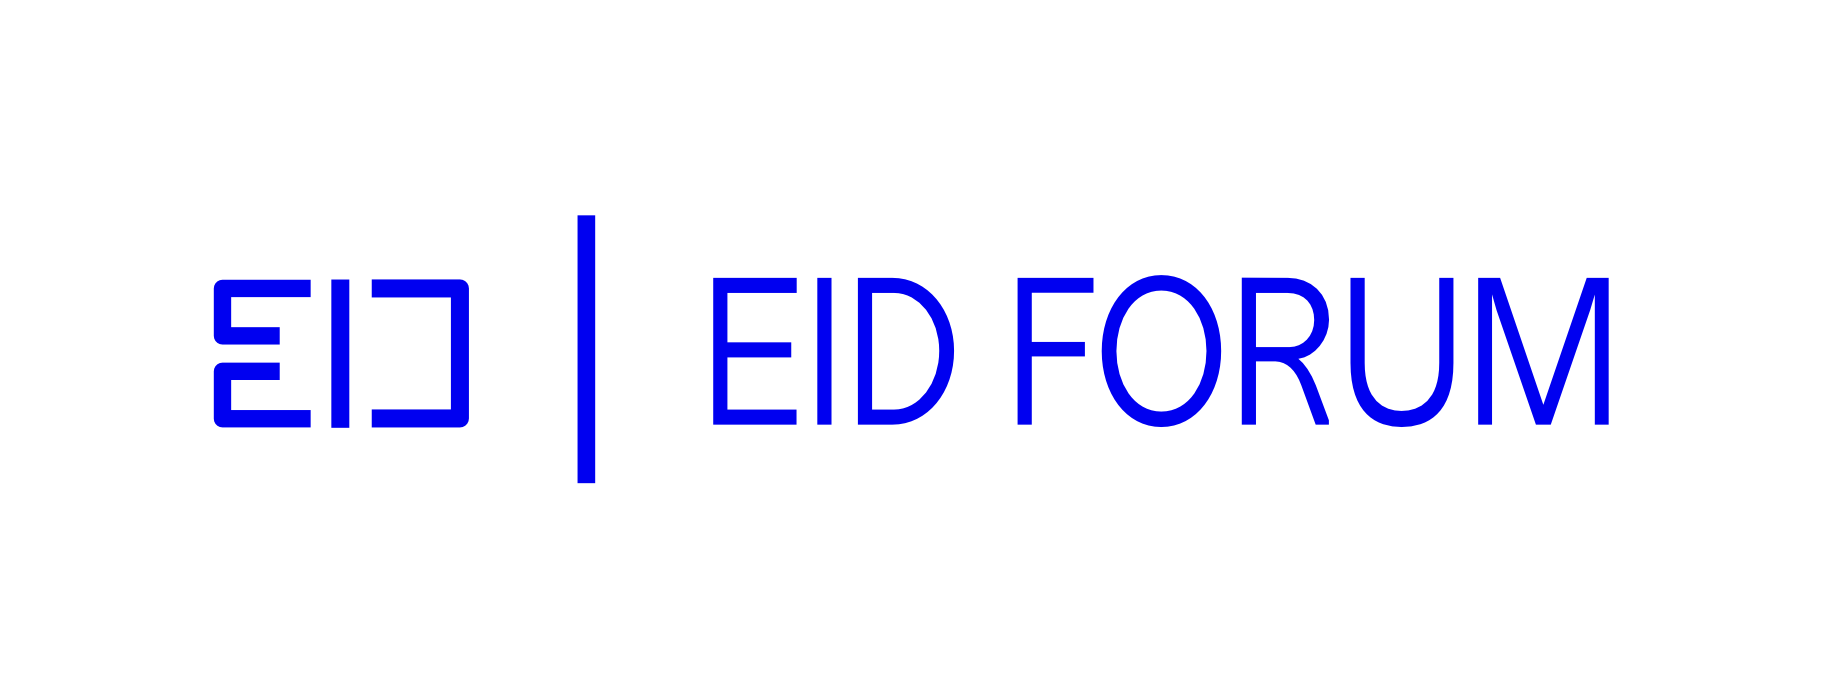 EID FORUM 2018 - SIA Strategic Association Partner